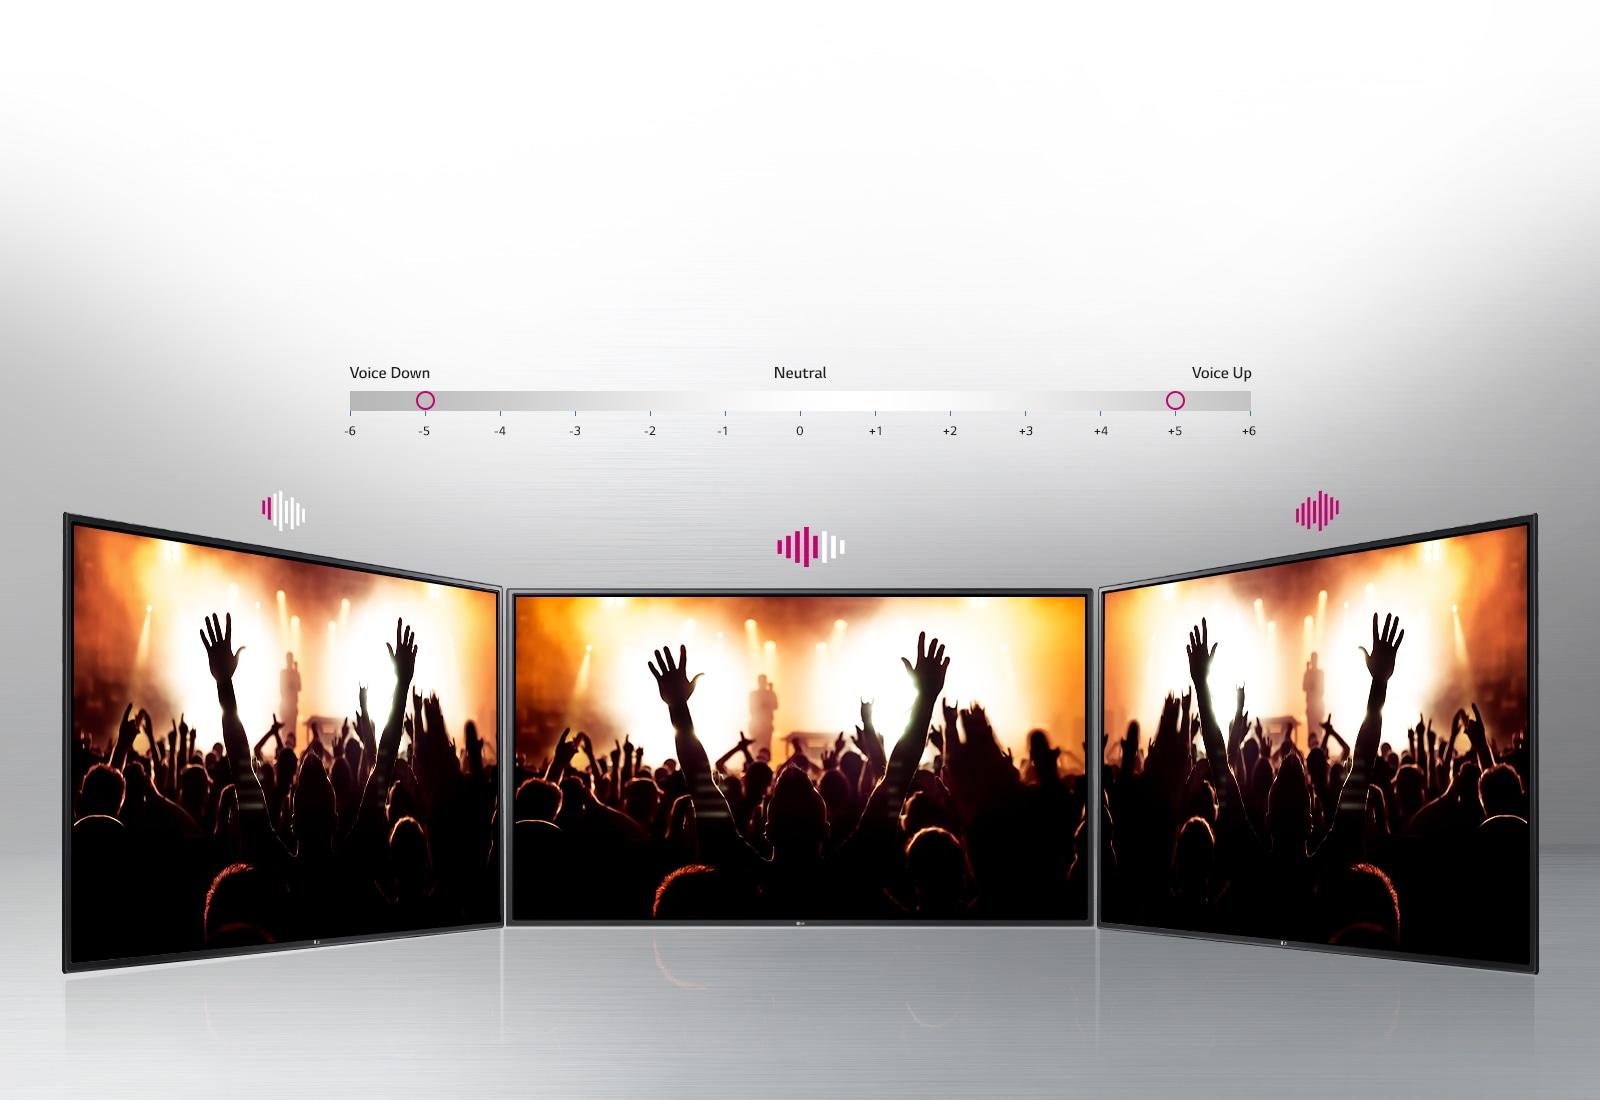 Clear Voice III ระบบปรับความชัดของเสียงสนทนา